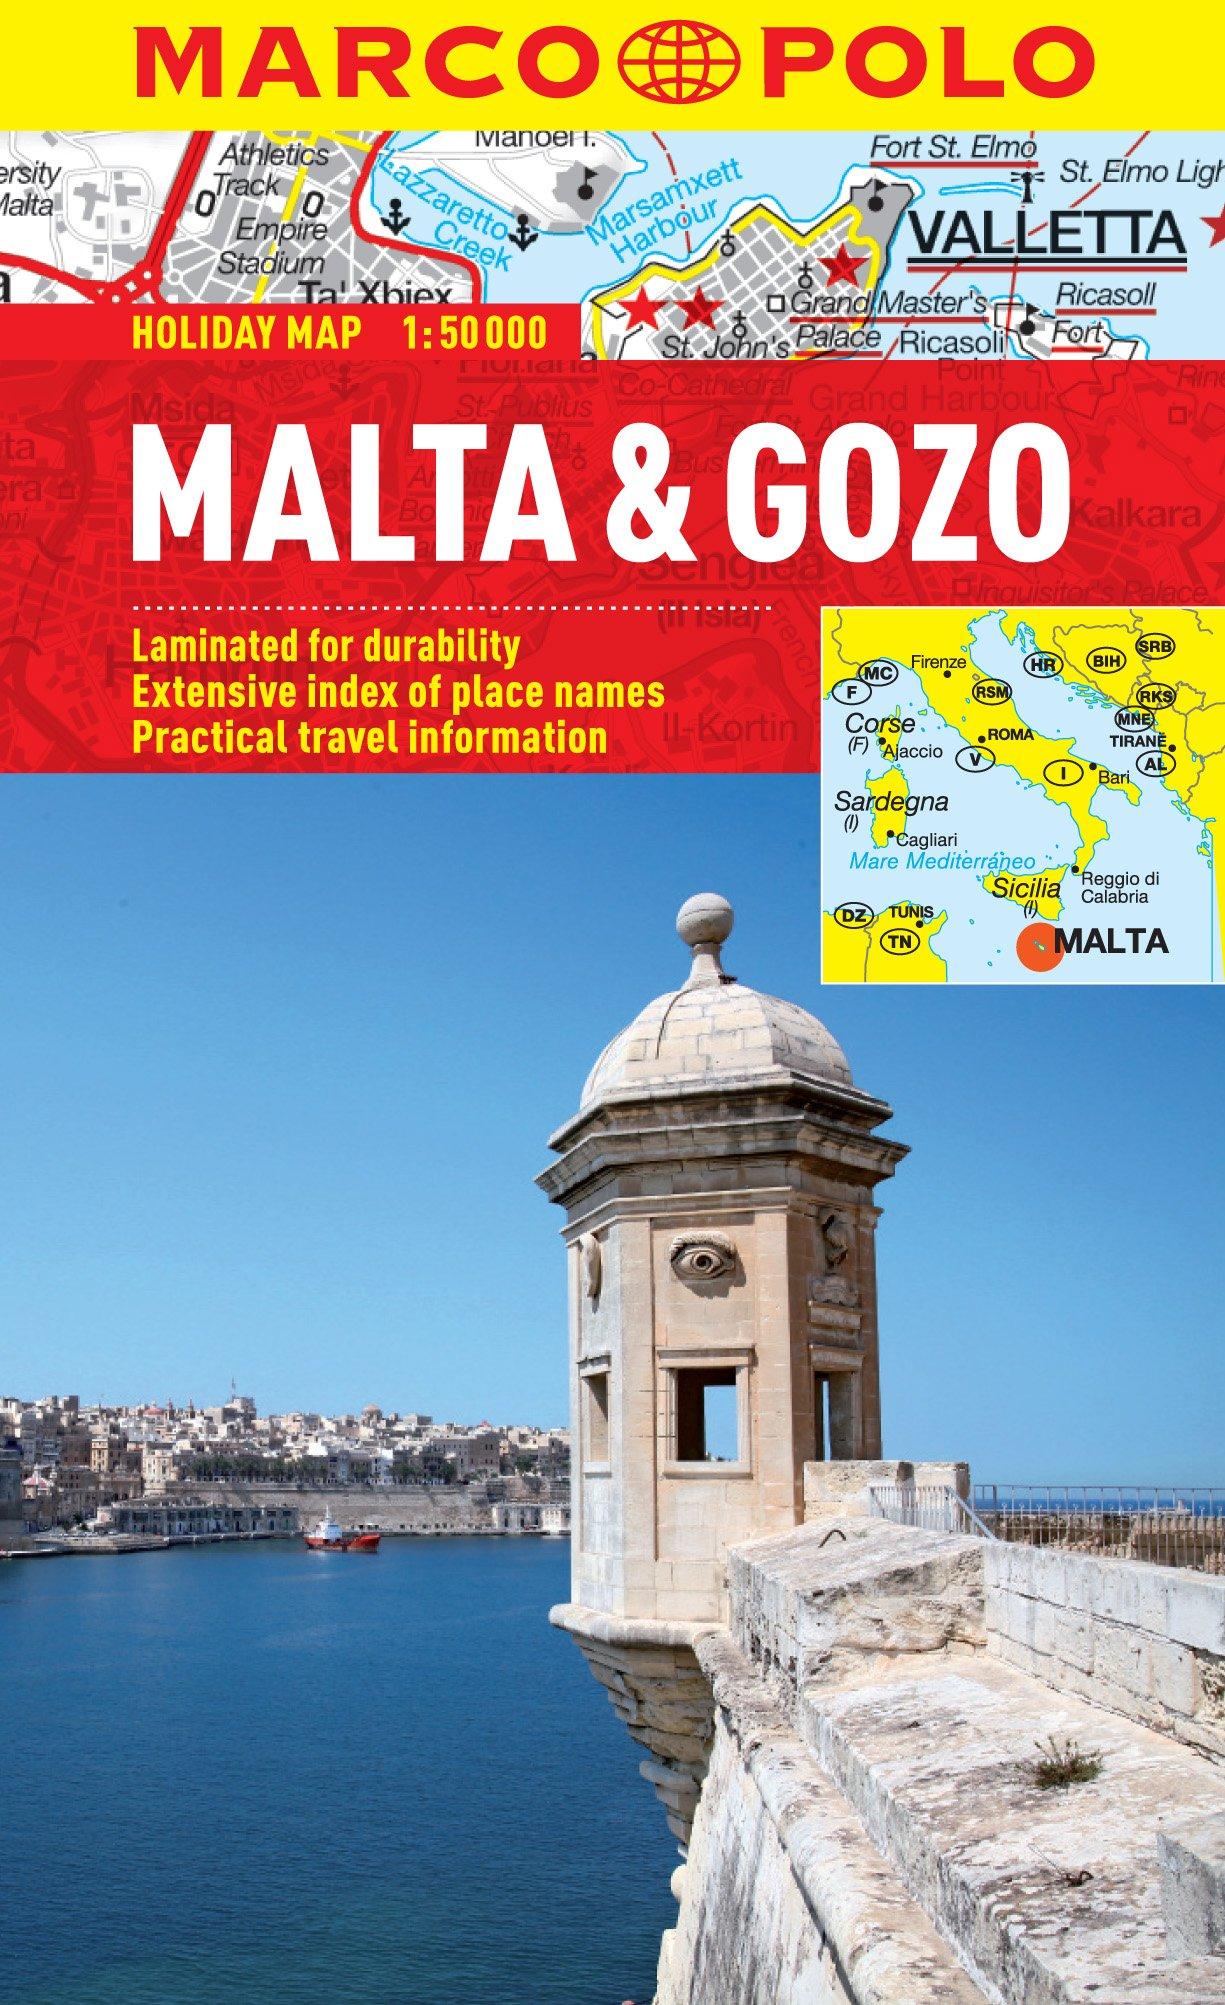 Malta Gozo Marco Polo Holiday Map Marco Polo Holiday Maps - Malta map